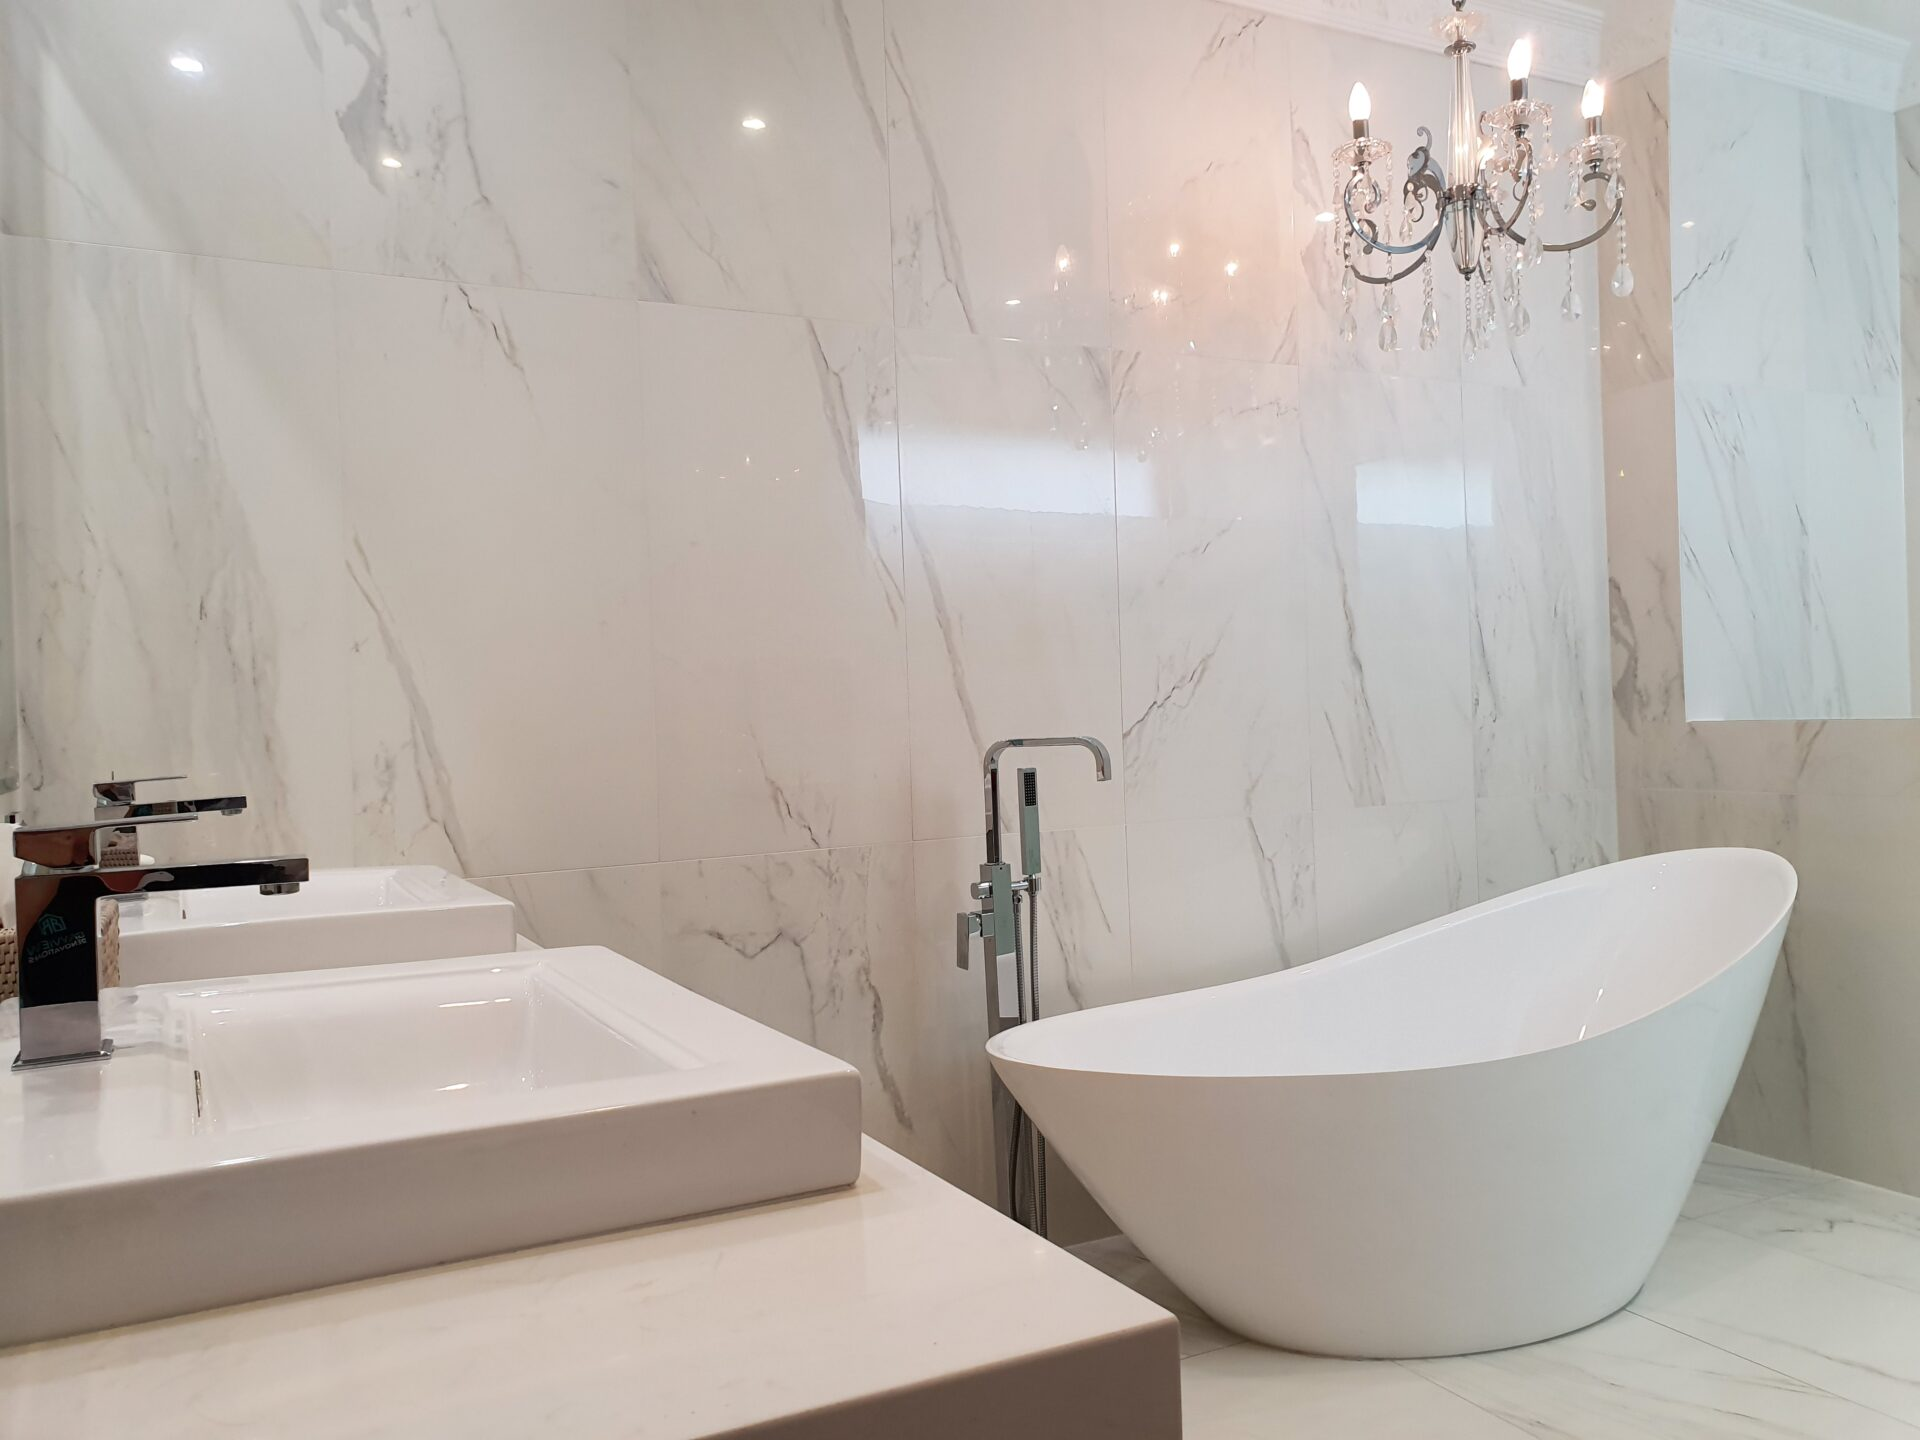 Bathtub Renovations Services - Bayview Renovations